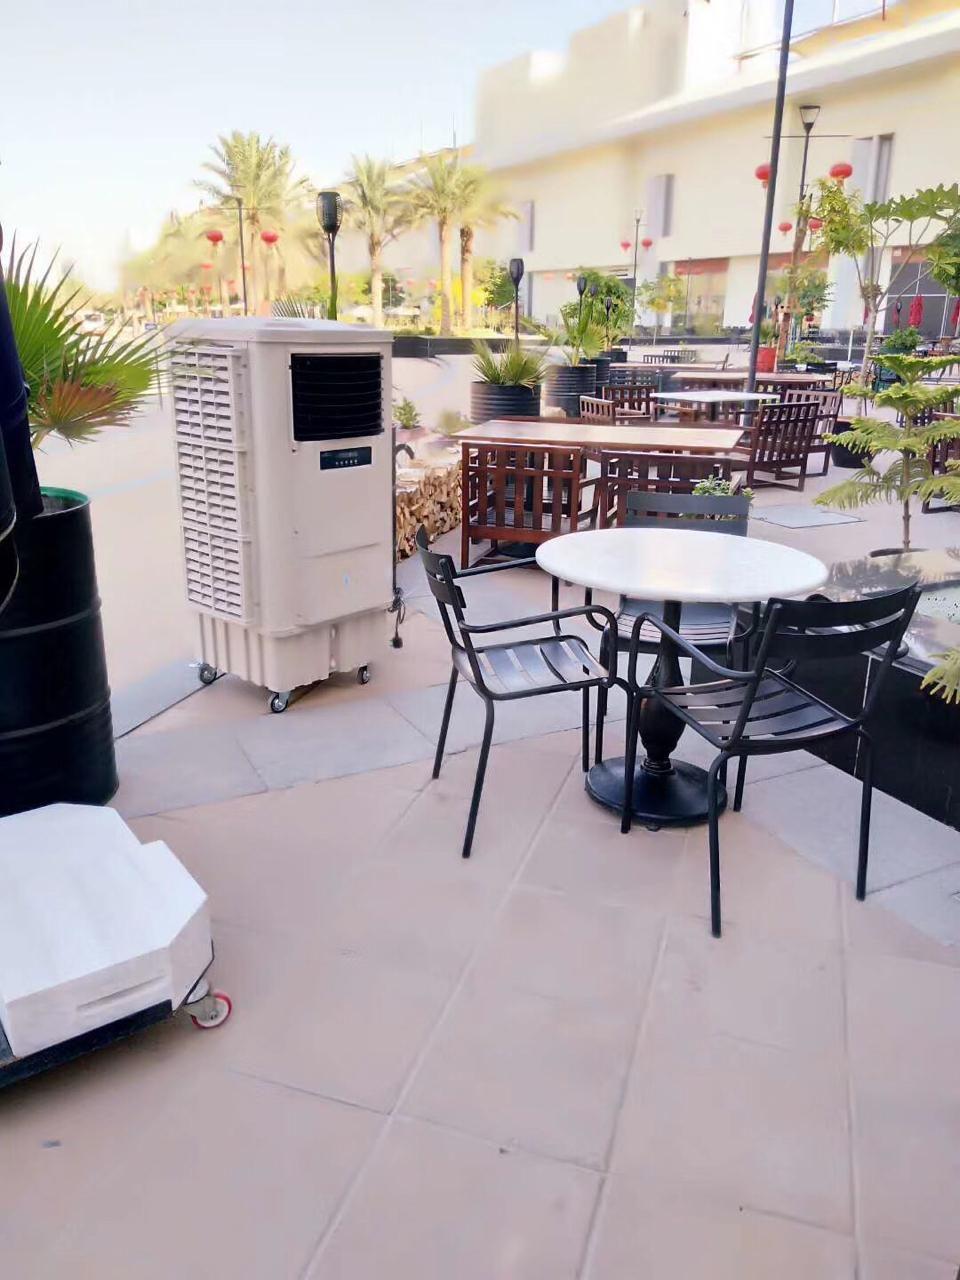 outdooraircooler outdoorcooler outdooraircoolerprice